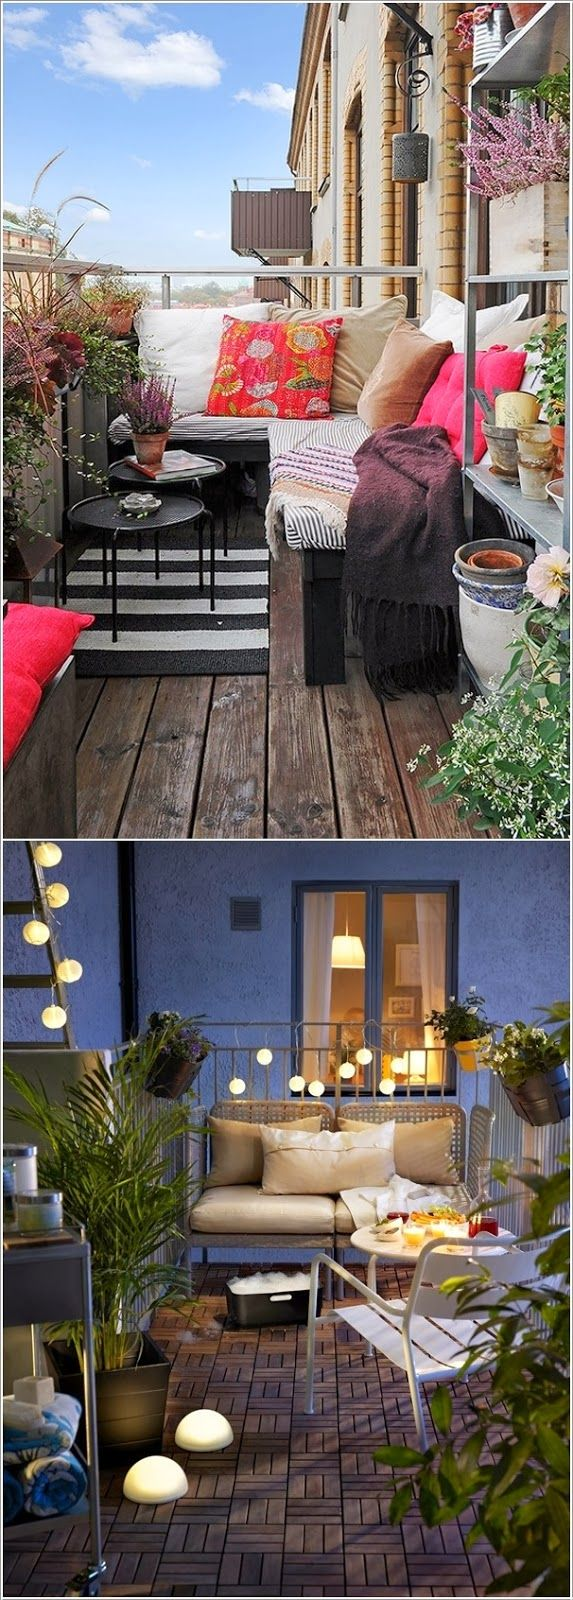 10 idées de décoration de Balcons | Balkon, Sammeln und kleine Balkone